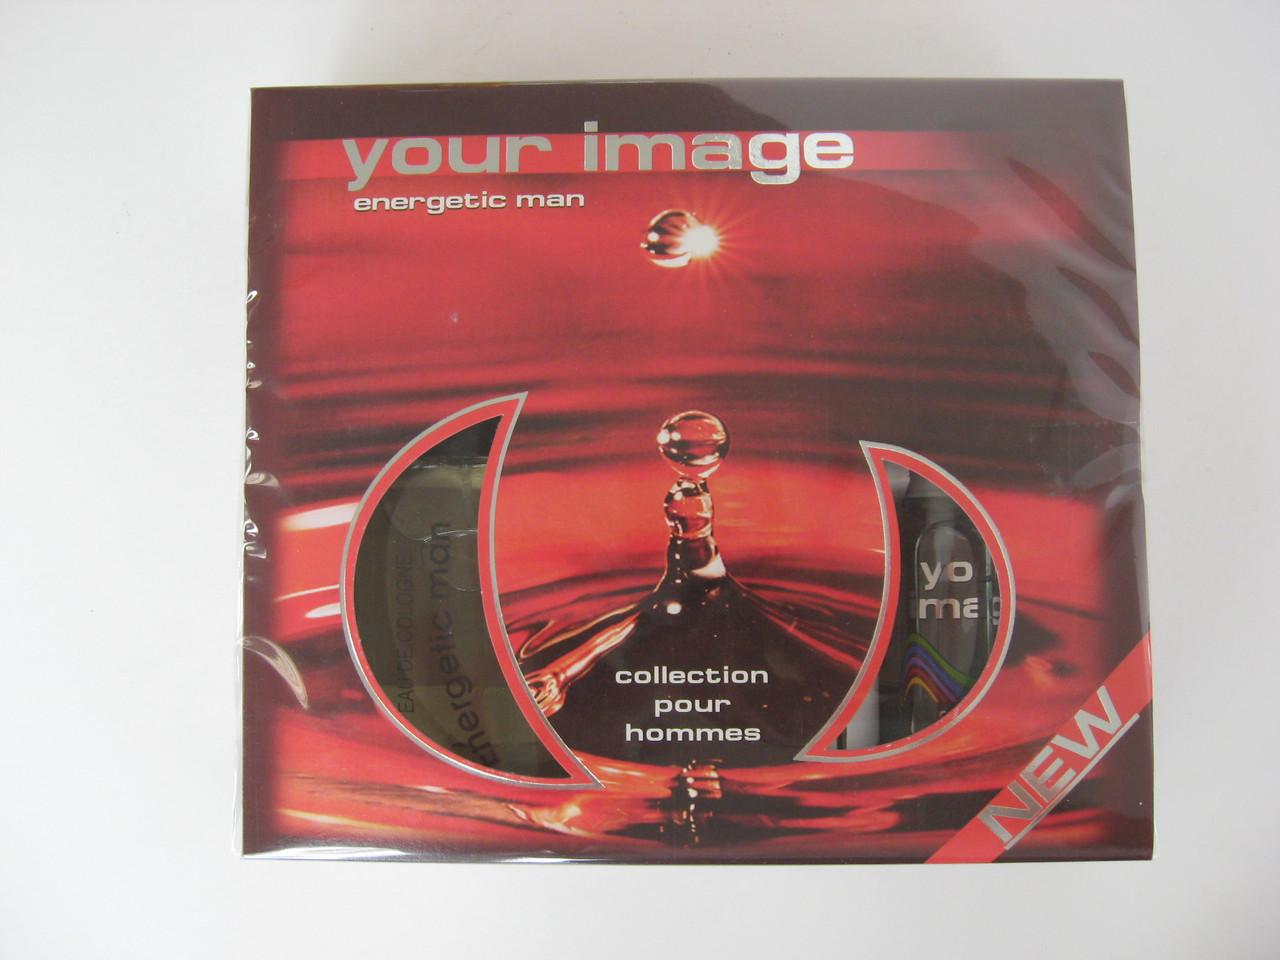 Парфумерний набір - for men - Energetic (Your image) туалетна вода 100мл + рідкий антиперспірант